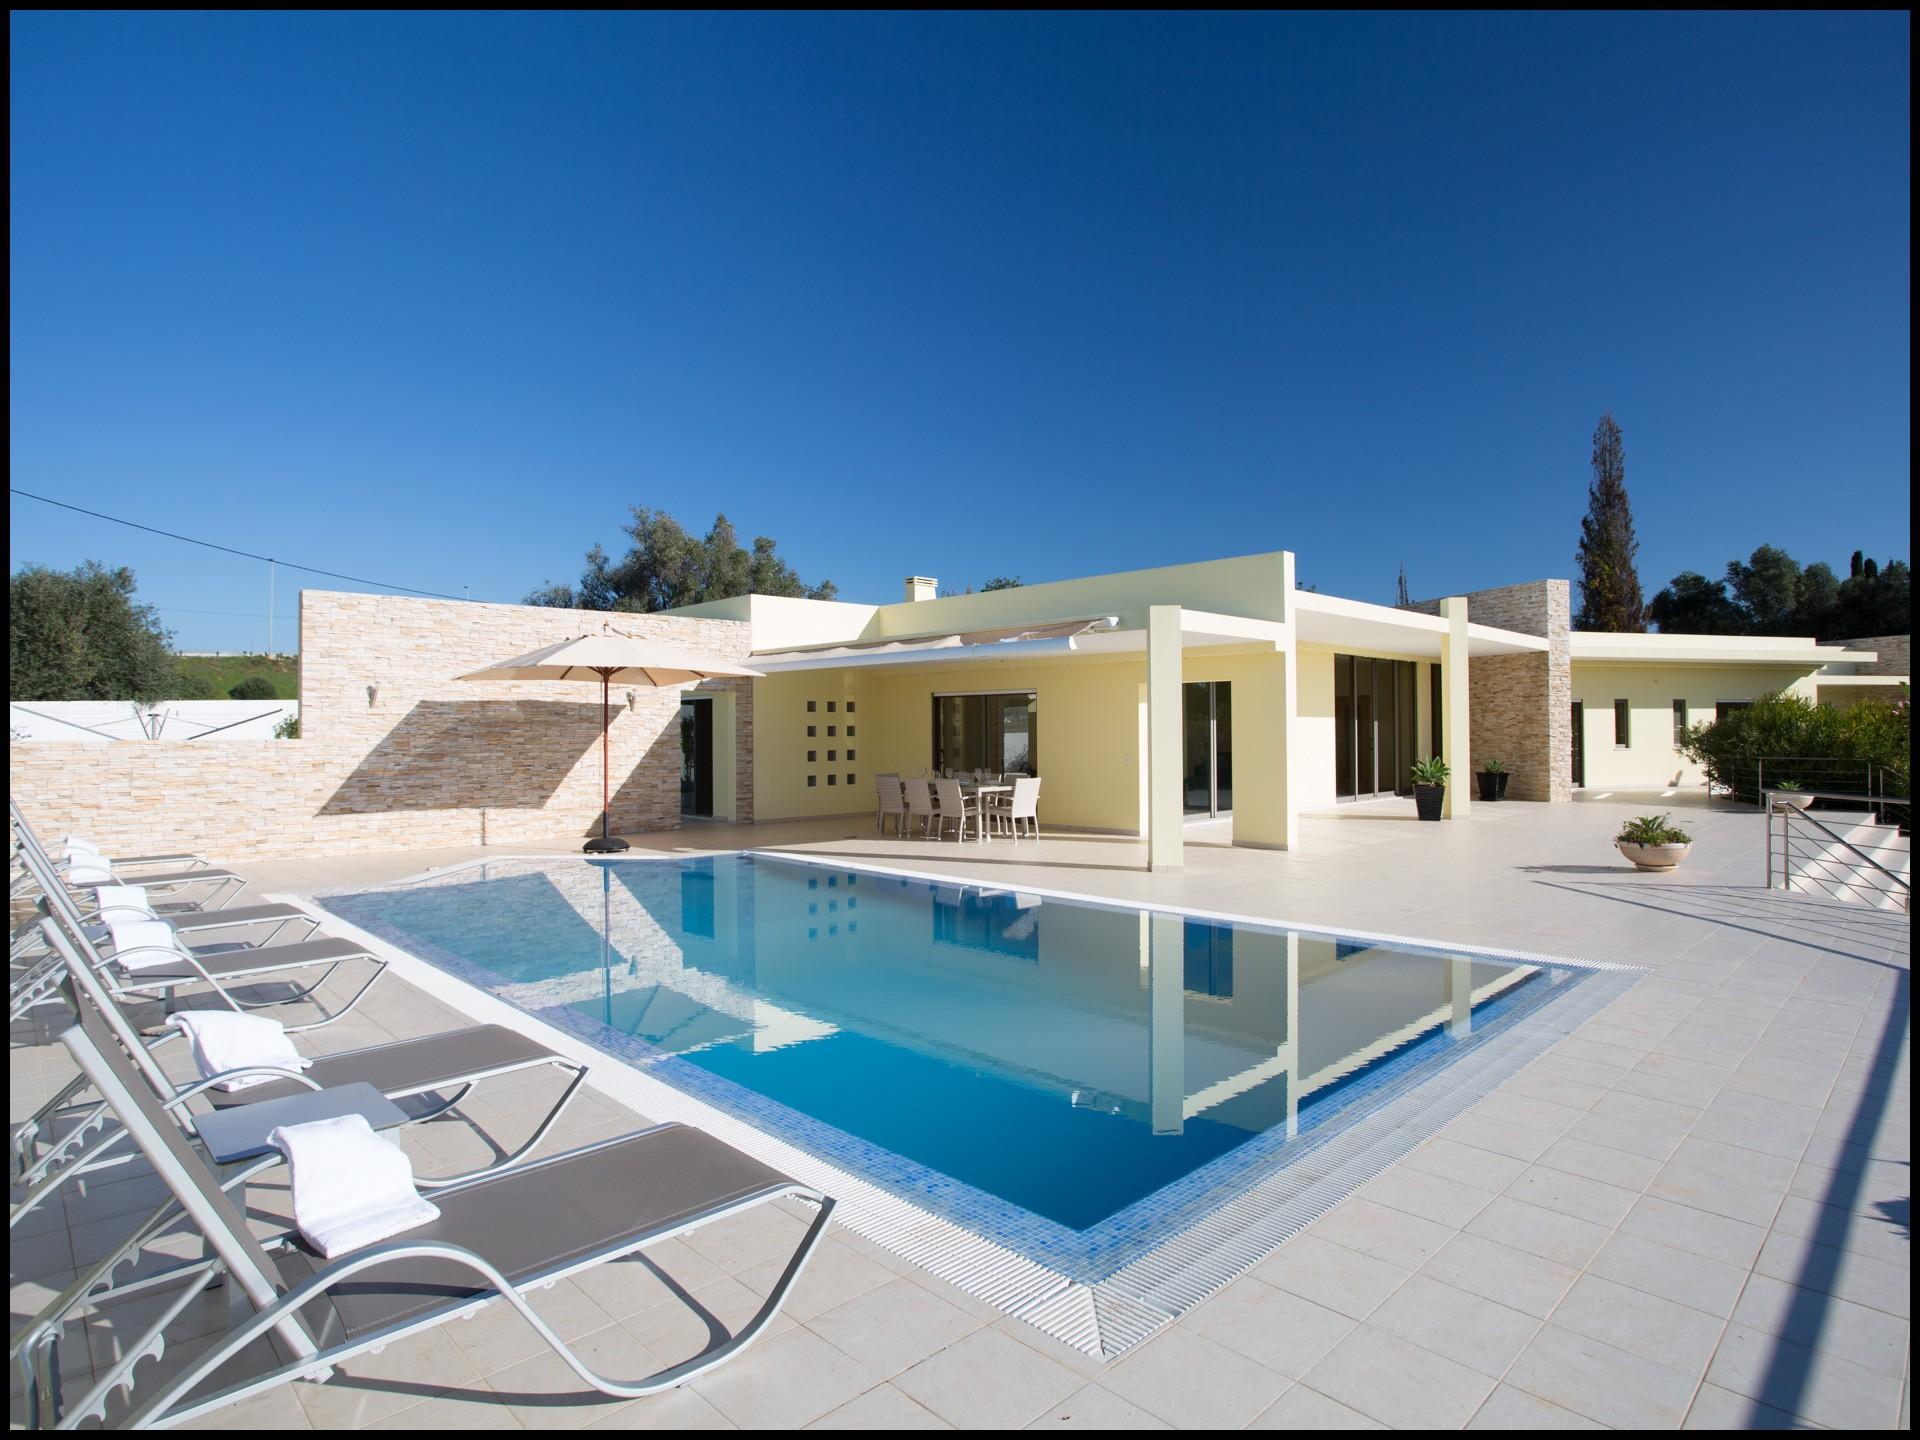 location maison a l 39 annee au portugal. Black Bedroom Furniture Sets. Home Design Ideas